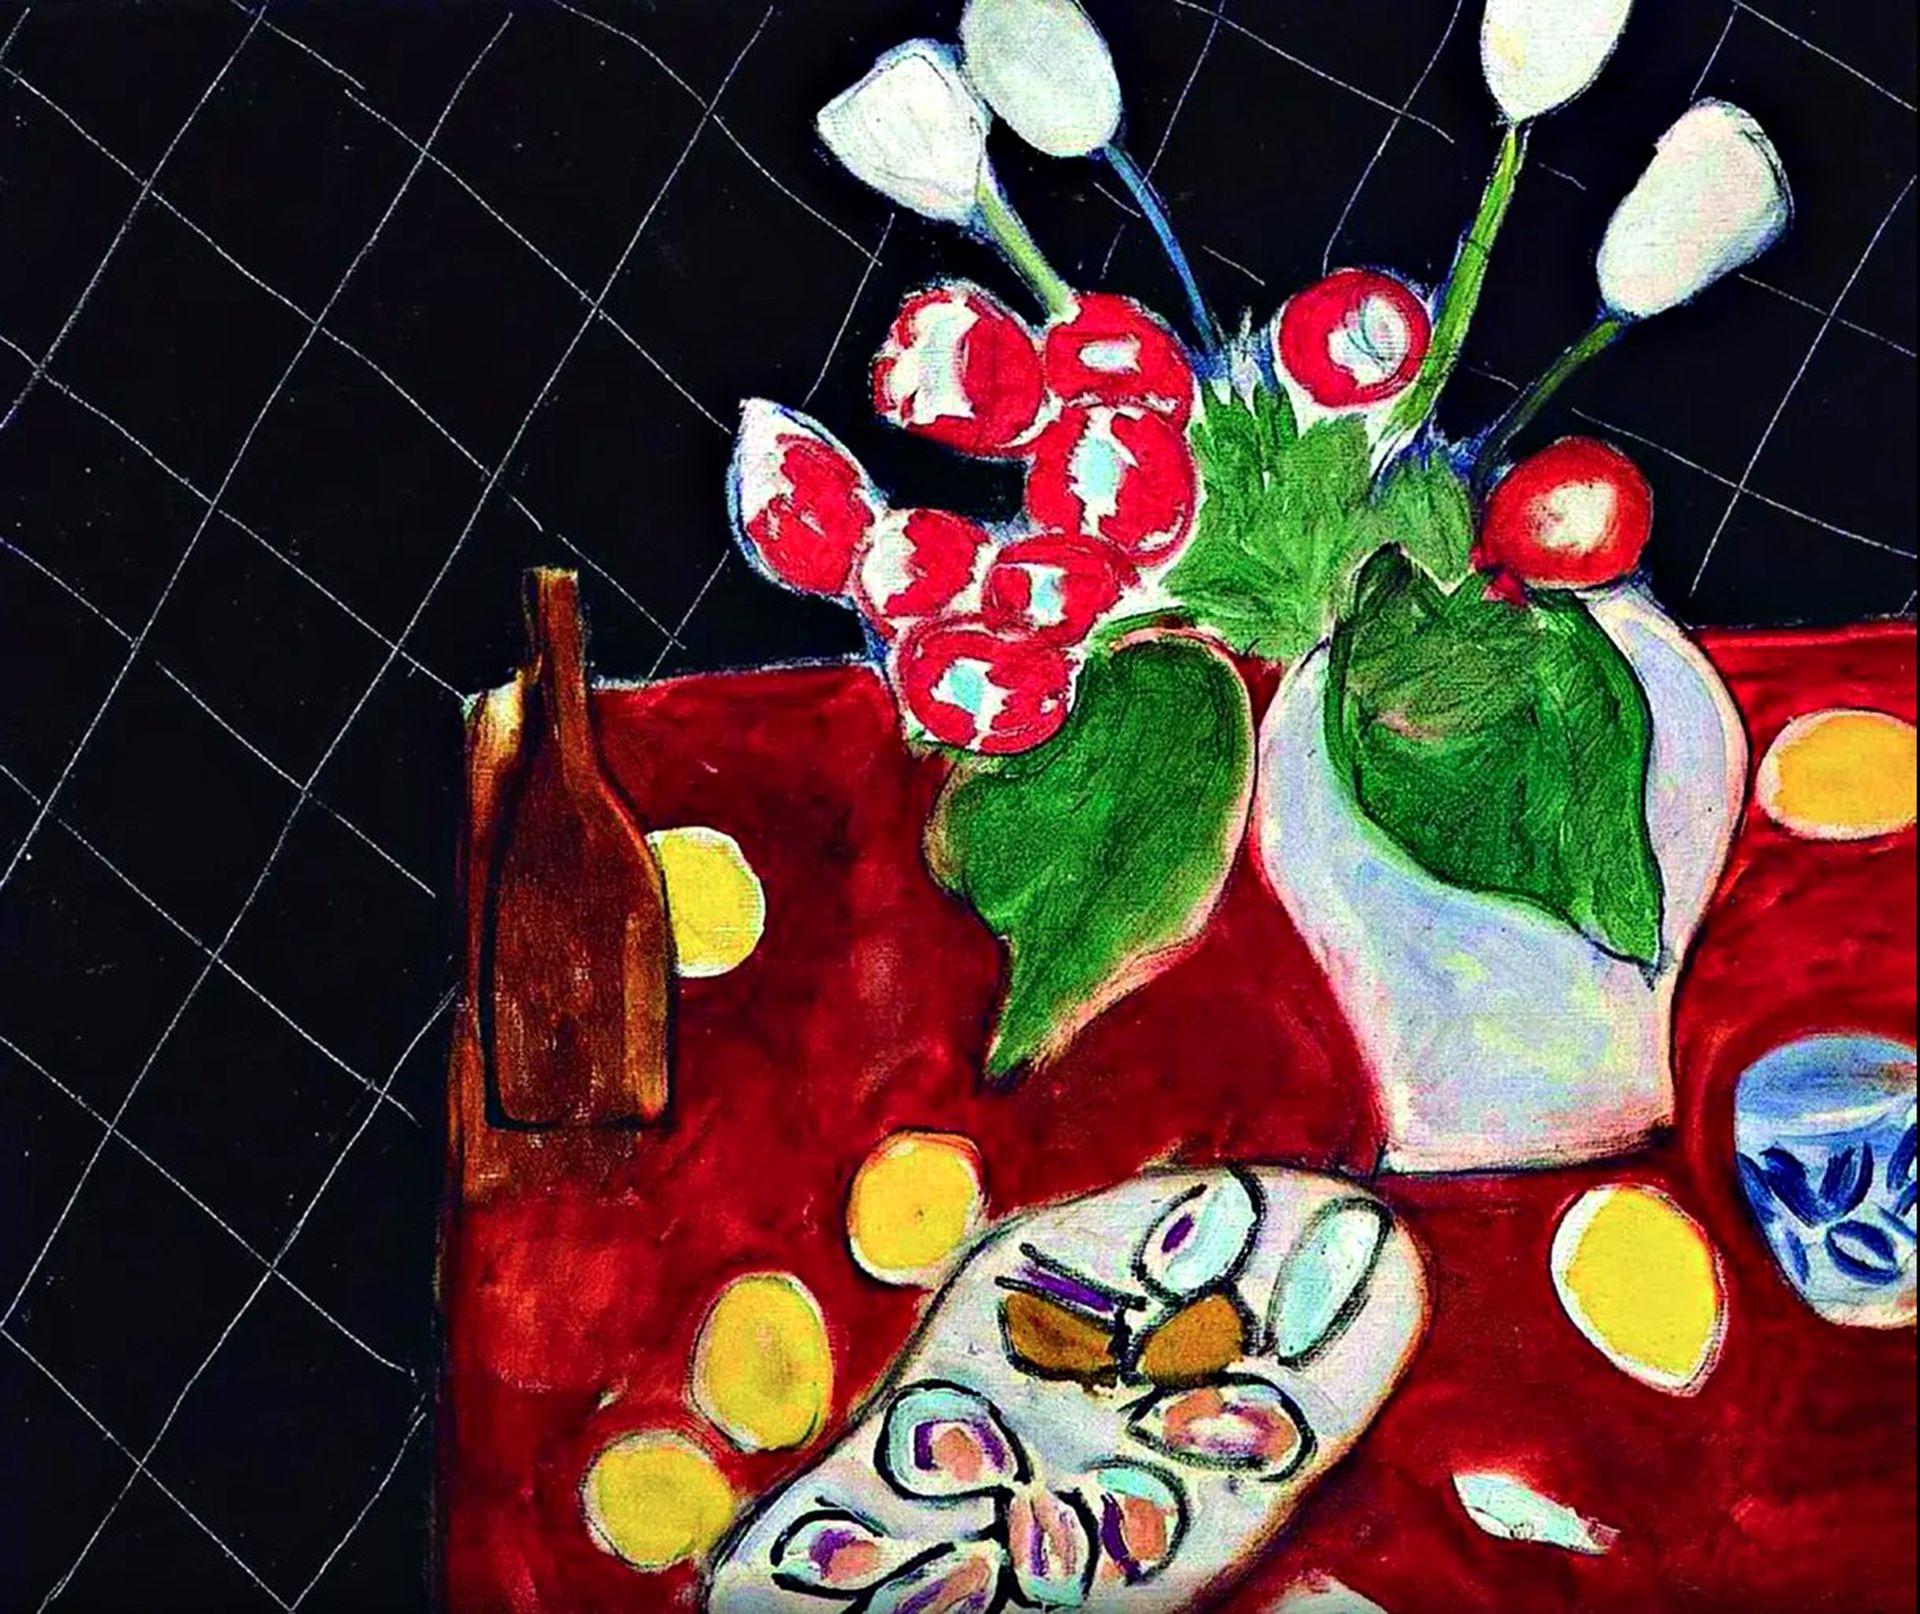 Tulipanes y ostras sobre fondo negro. Henri Matisse, 1943